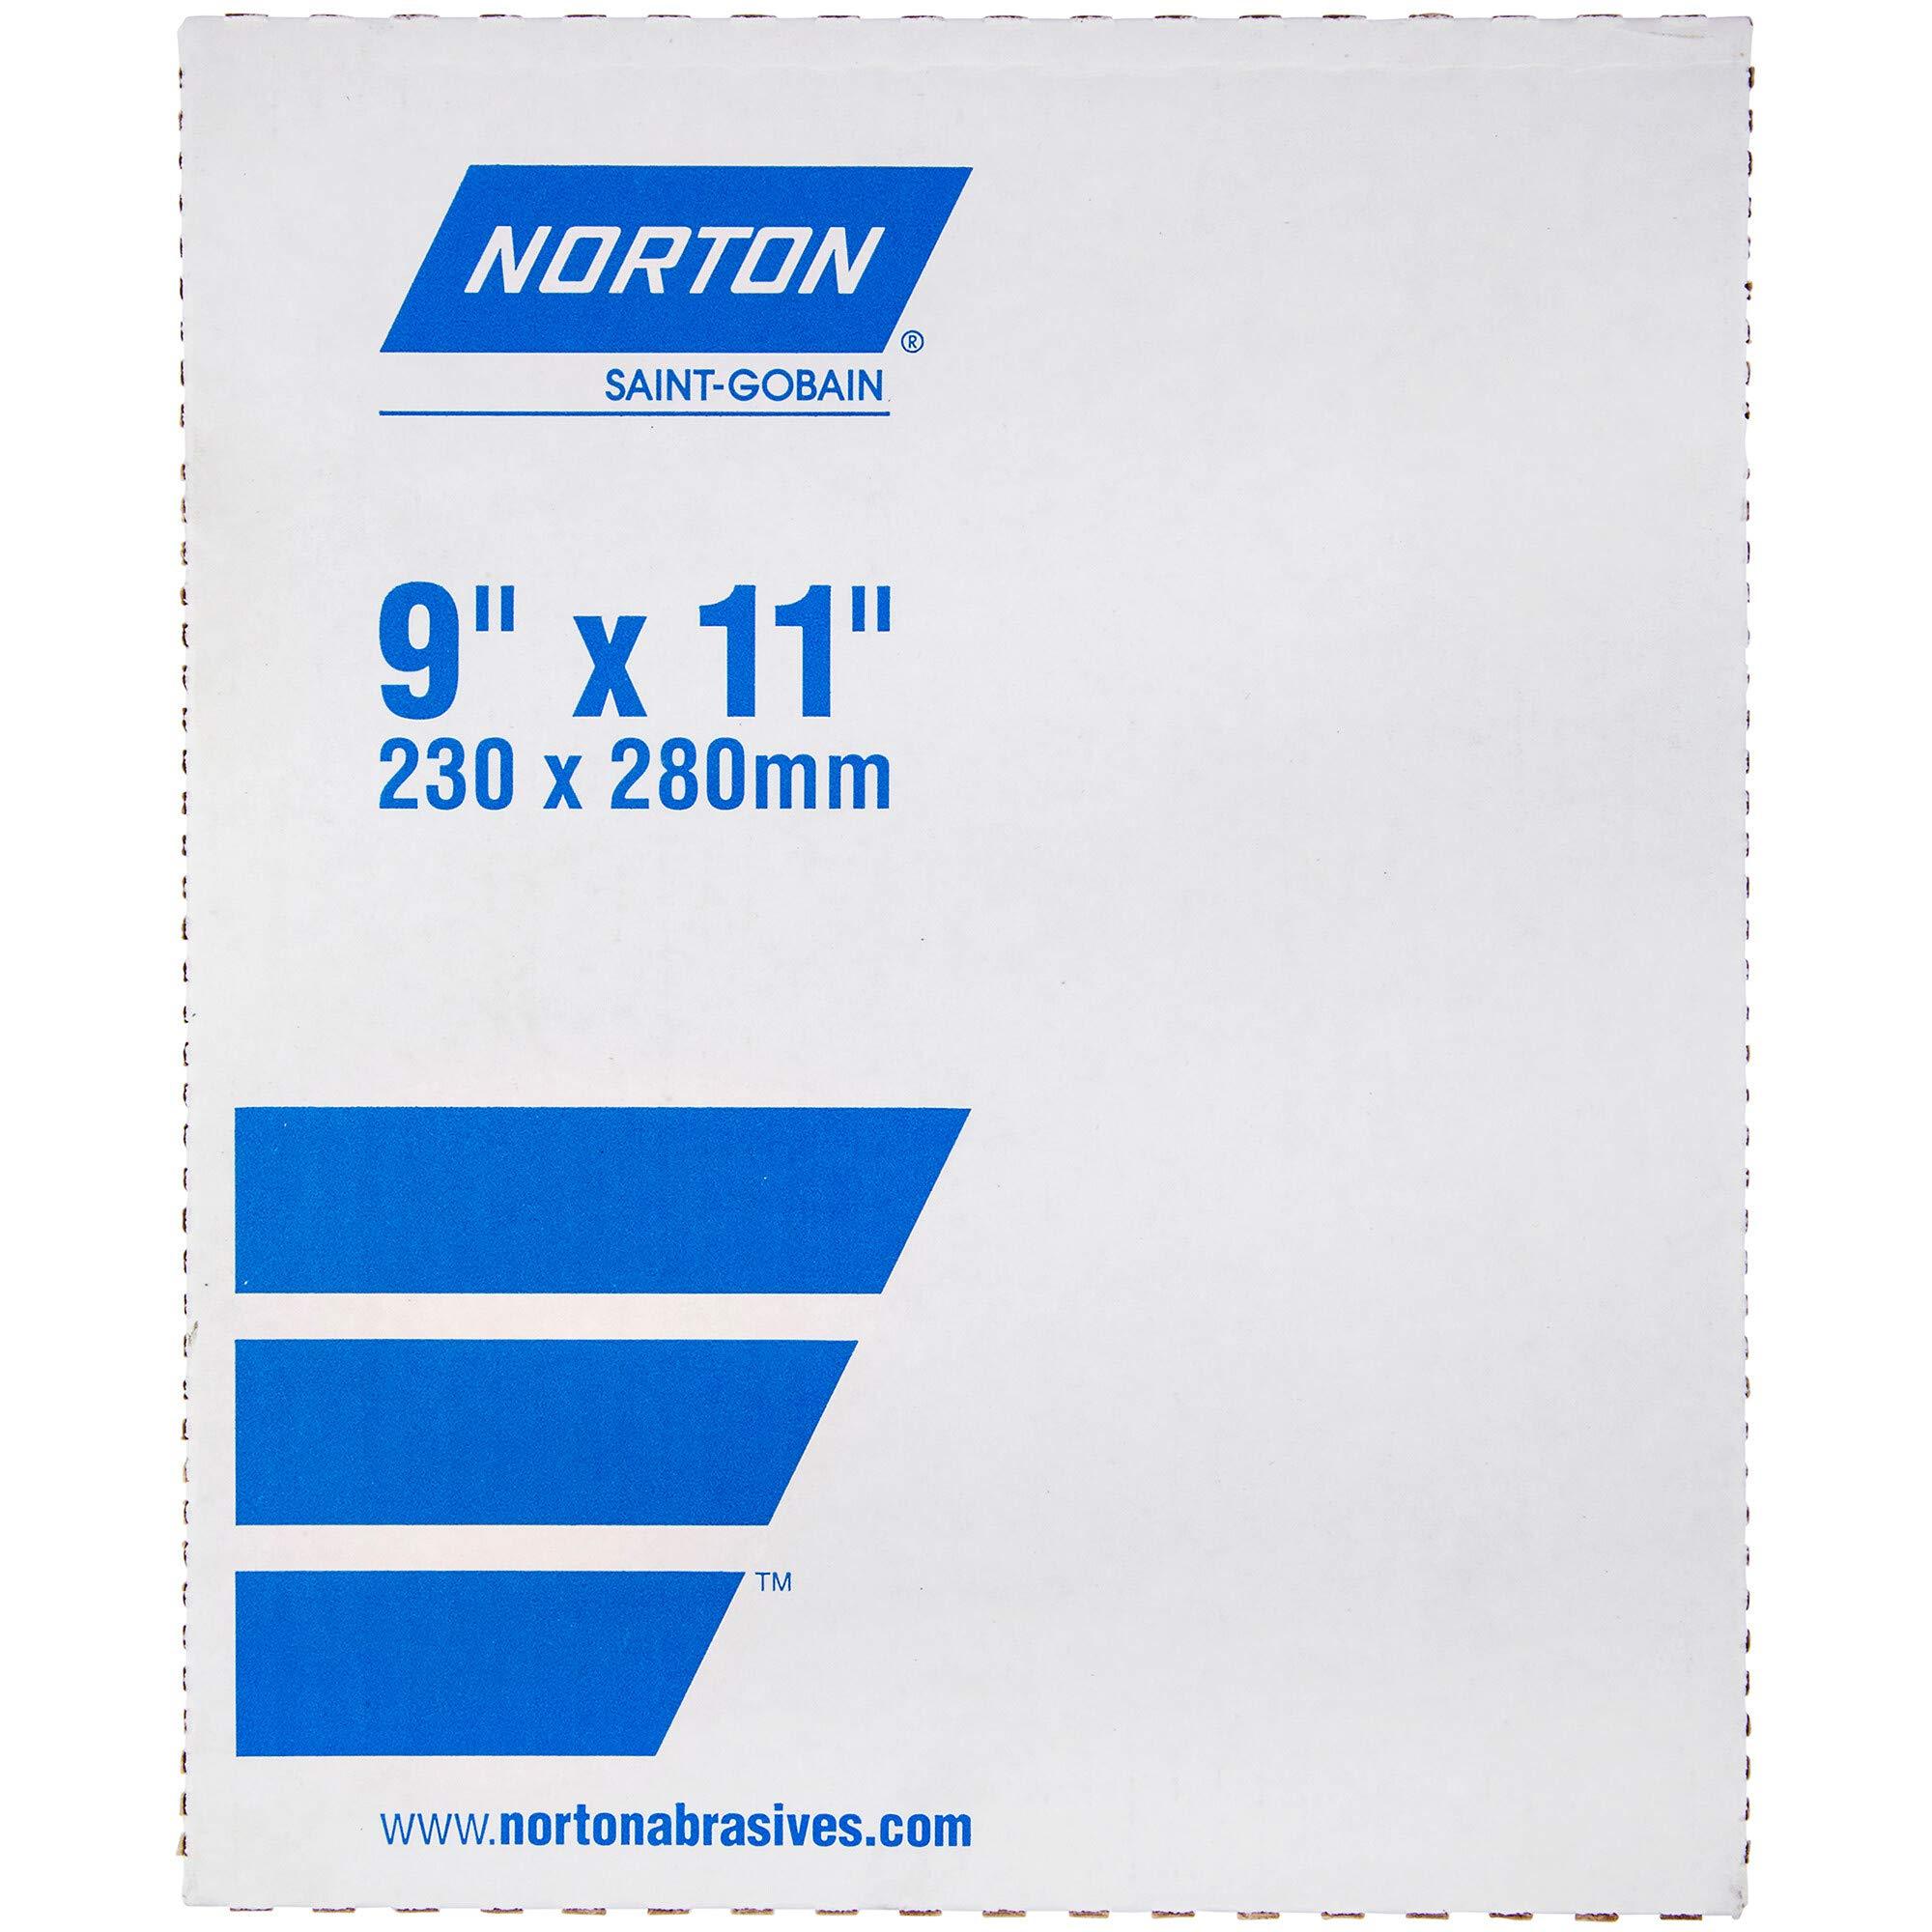 Norton T401 Black Ice Abrasive Sheet, Paper Backing, Silicon Carbide, Waterproof, Grit 1200 (Pack of 50)